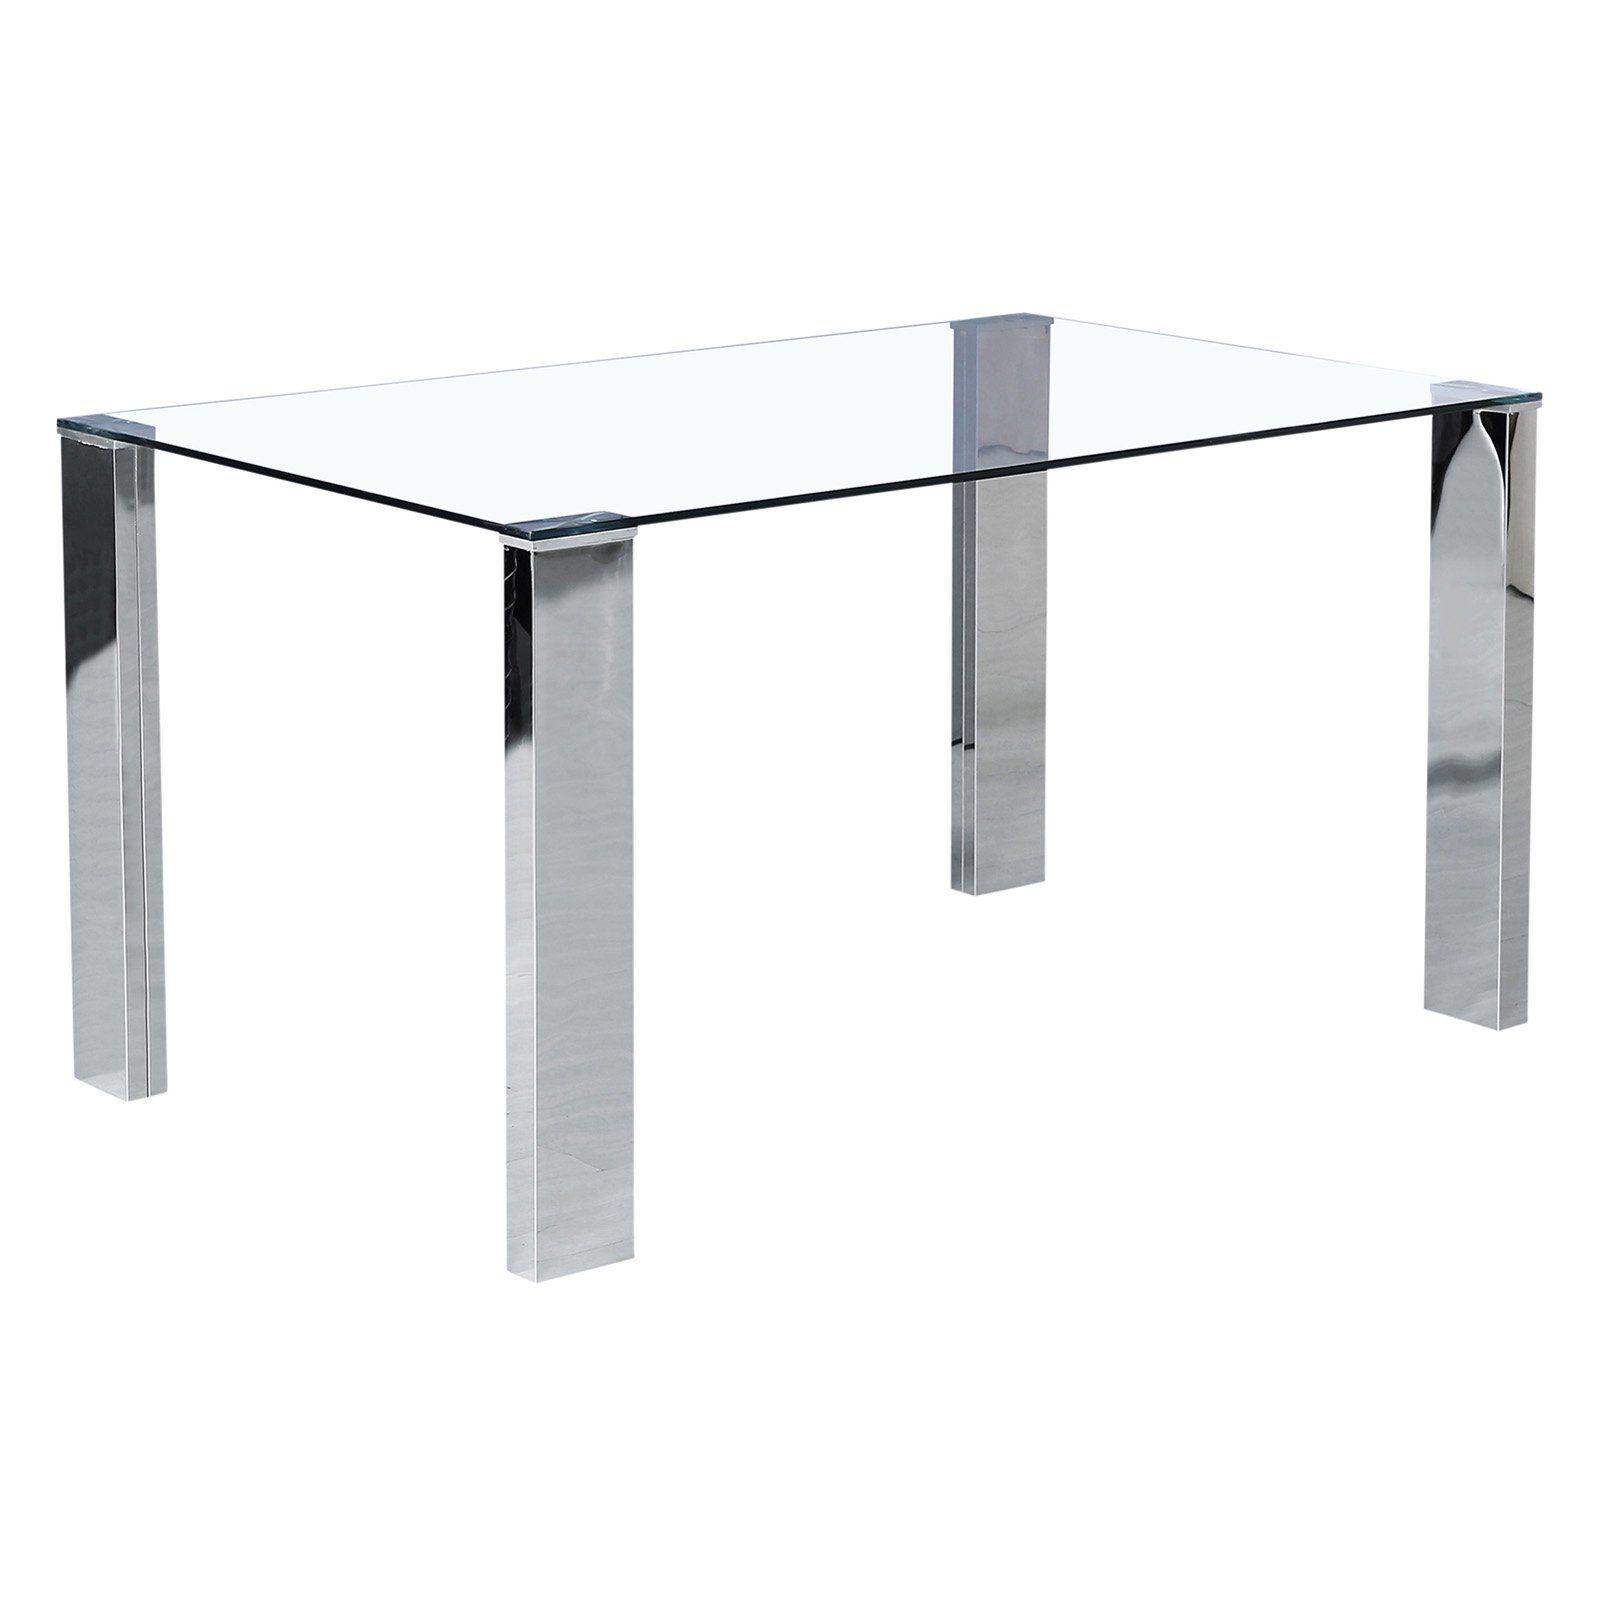 Worldwide Home Furnishings Rectangular Glass Dining Table | Glass dining table, Glass top dining ...